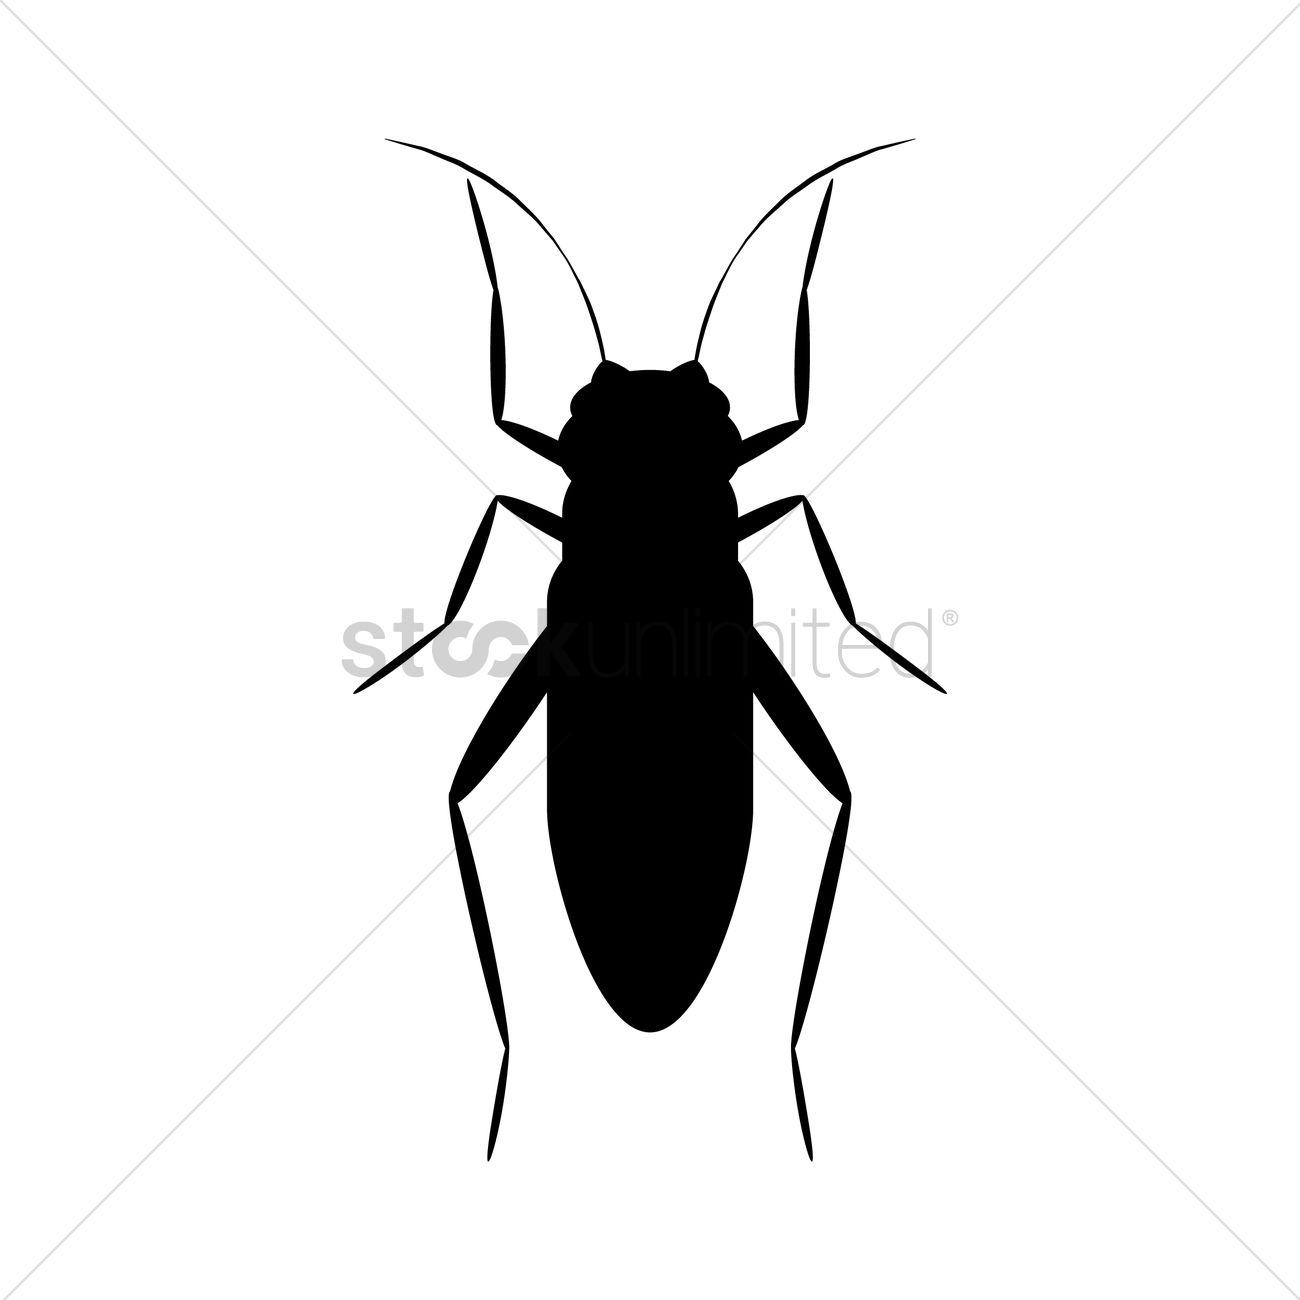 1300x1300 Cricket Silhouette Vector Image